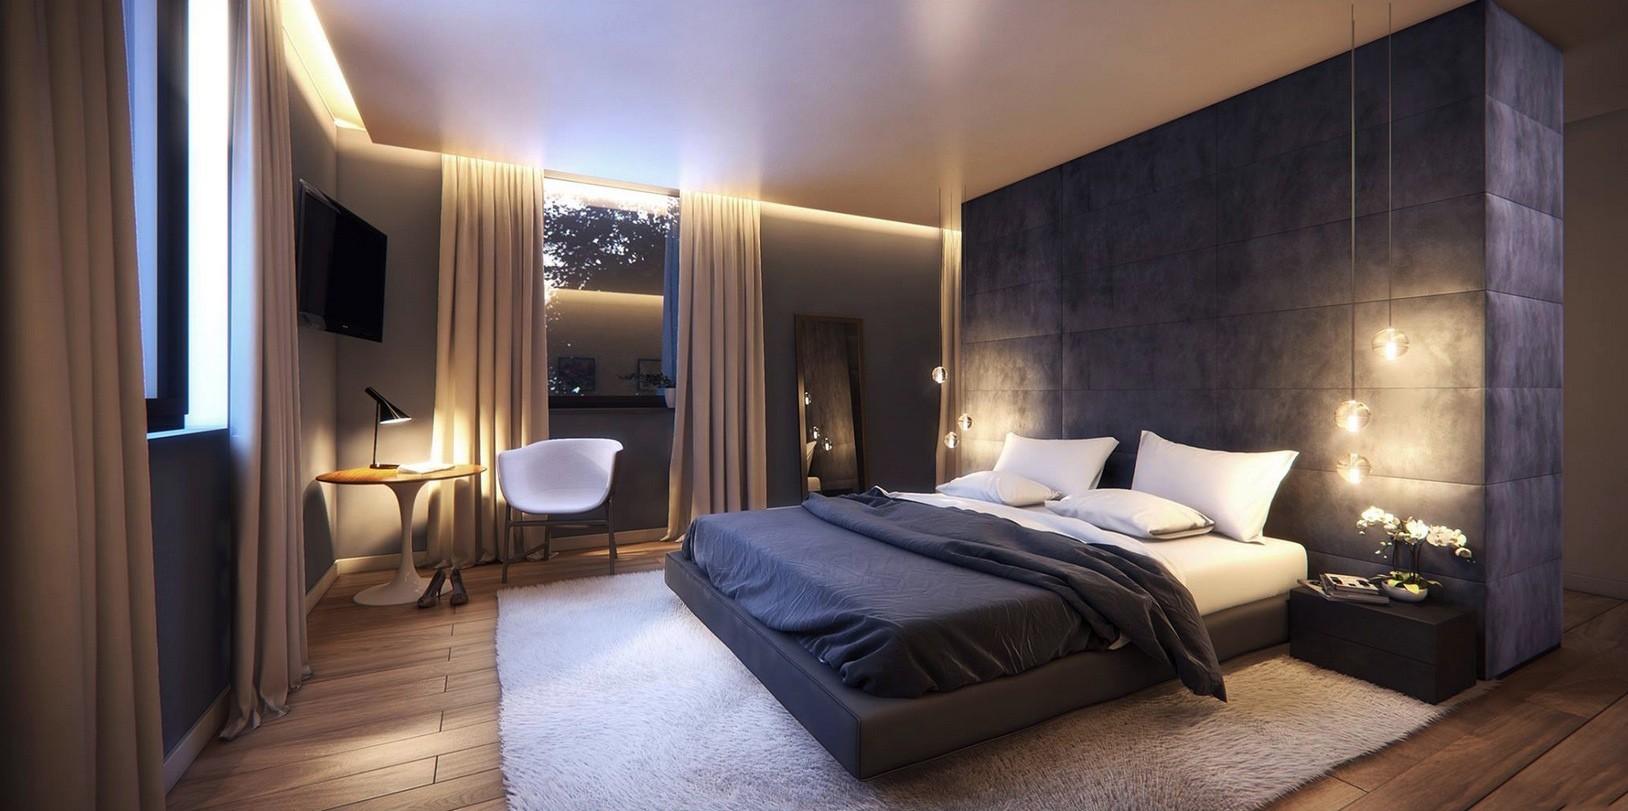 спальня в стиле модерн фото декор